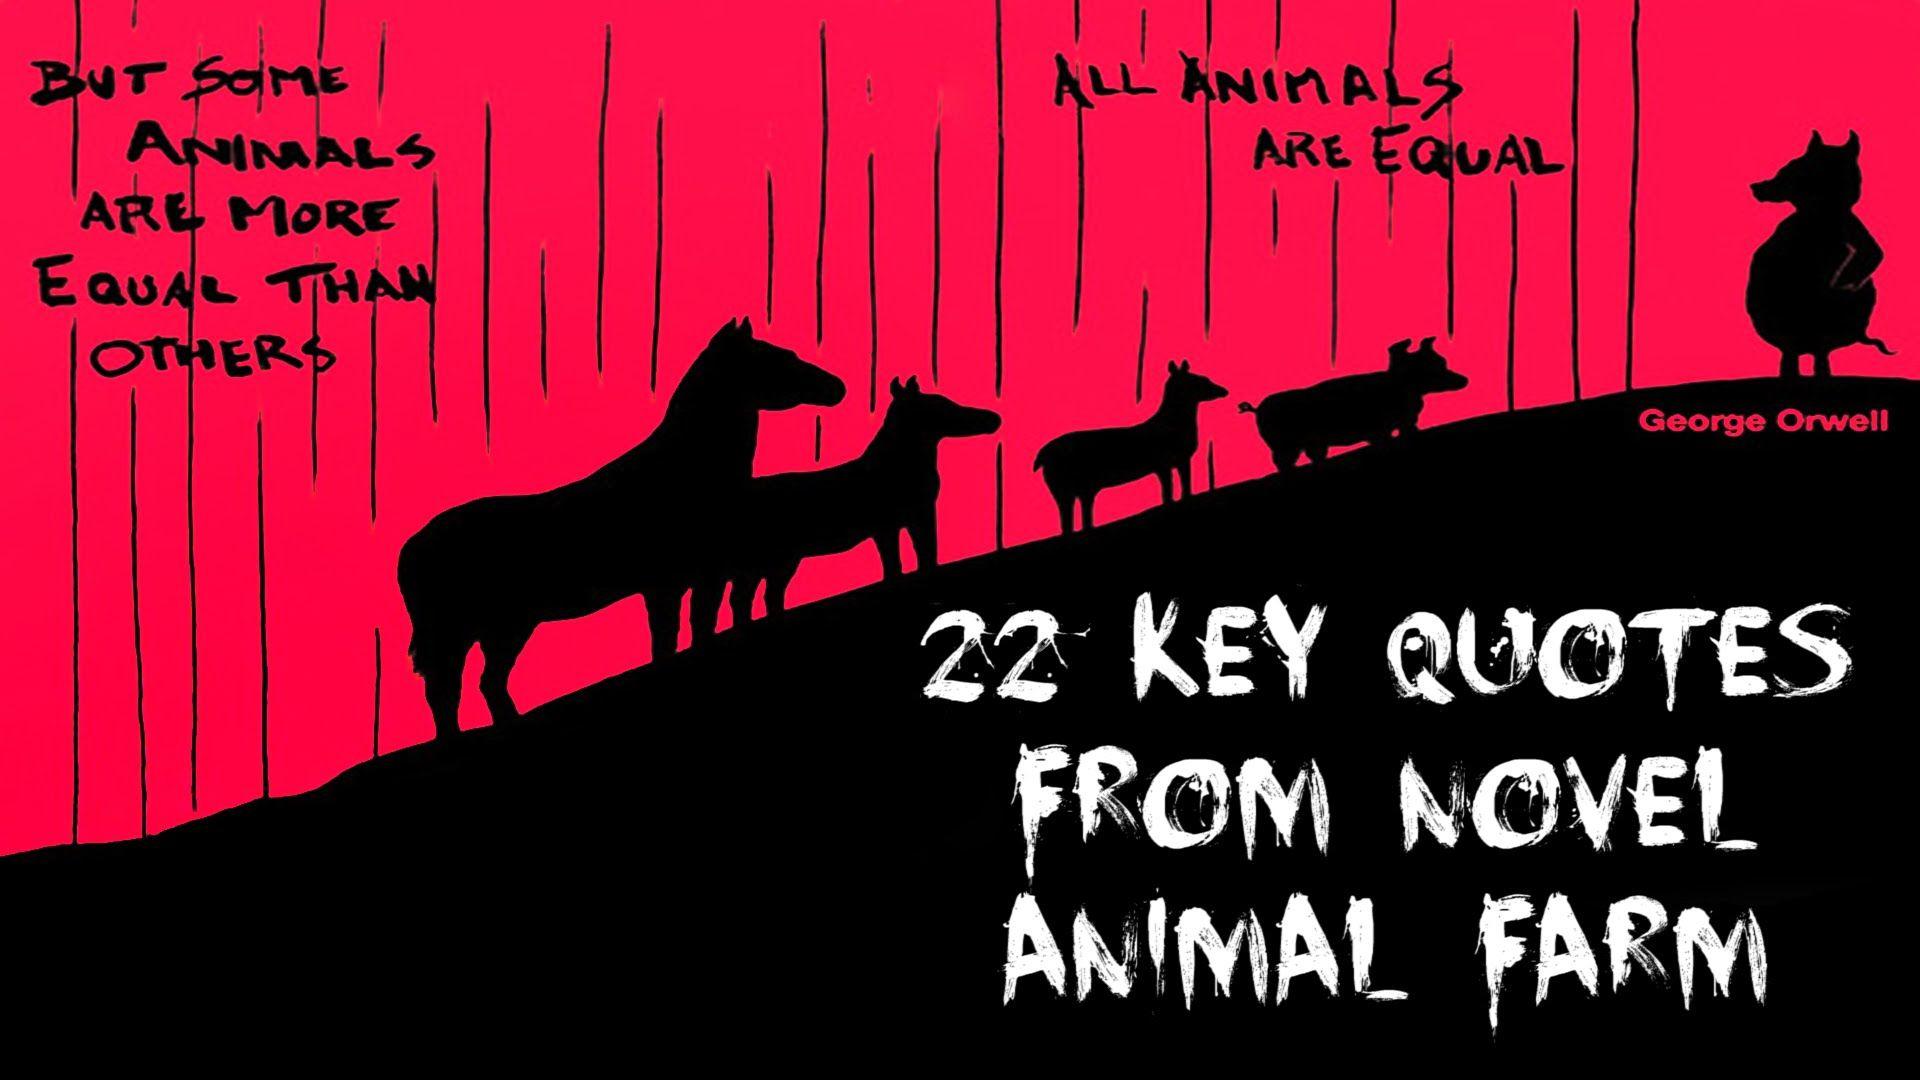 Animal Farm Quotes 22 Key Quotes From Novel Animal Farm #animalfarm #georgeorwell .